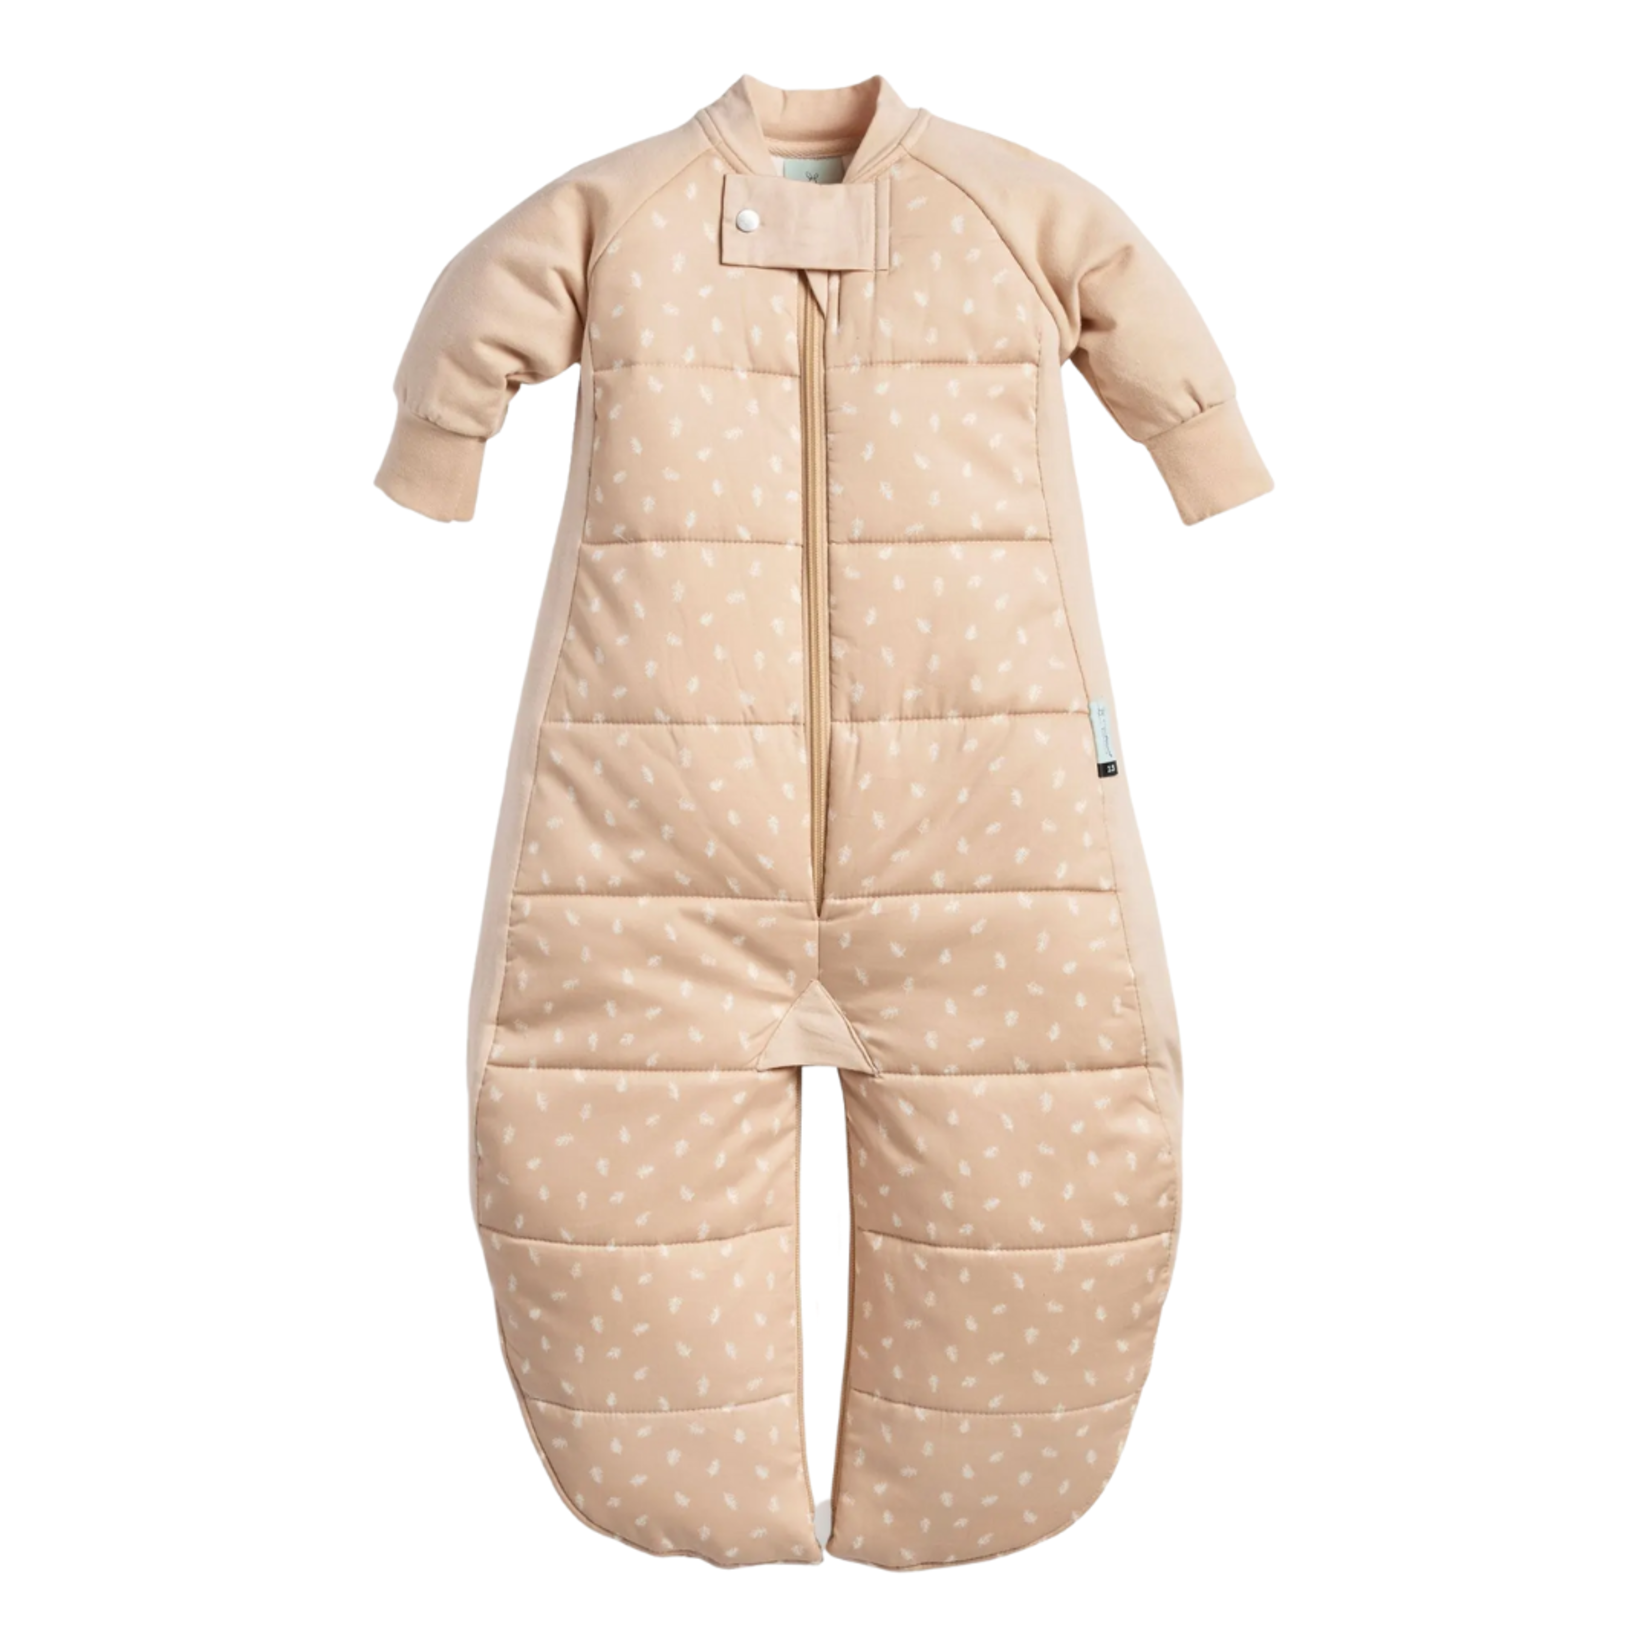 Ergopouch ErgoPouch Sleep Suit Bag. 3.5 Tog. 2-4 Years. Golden